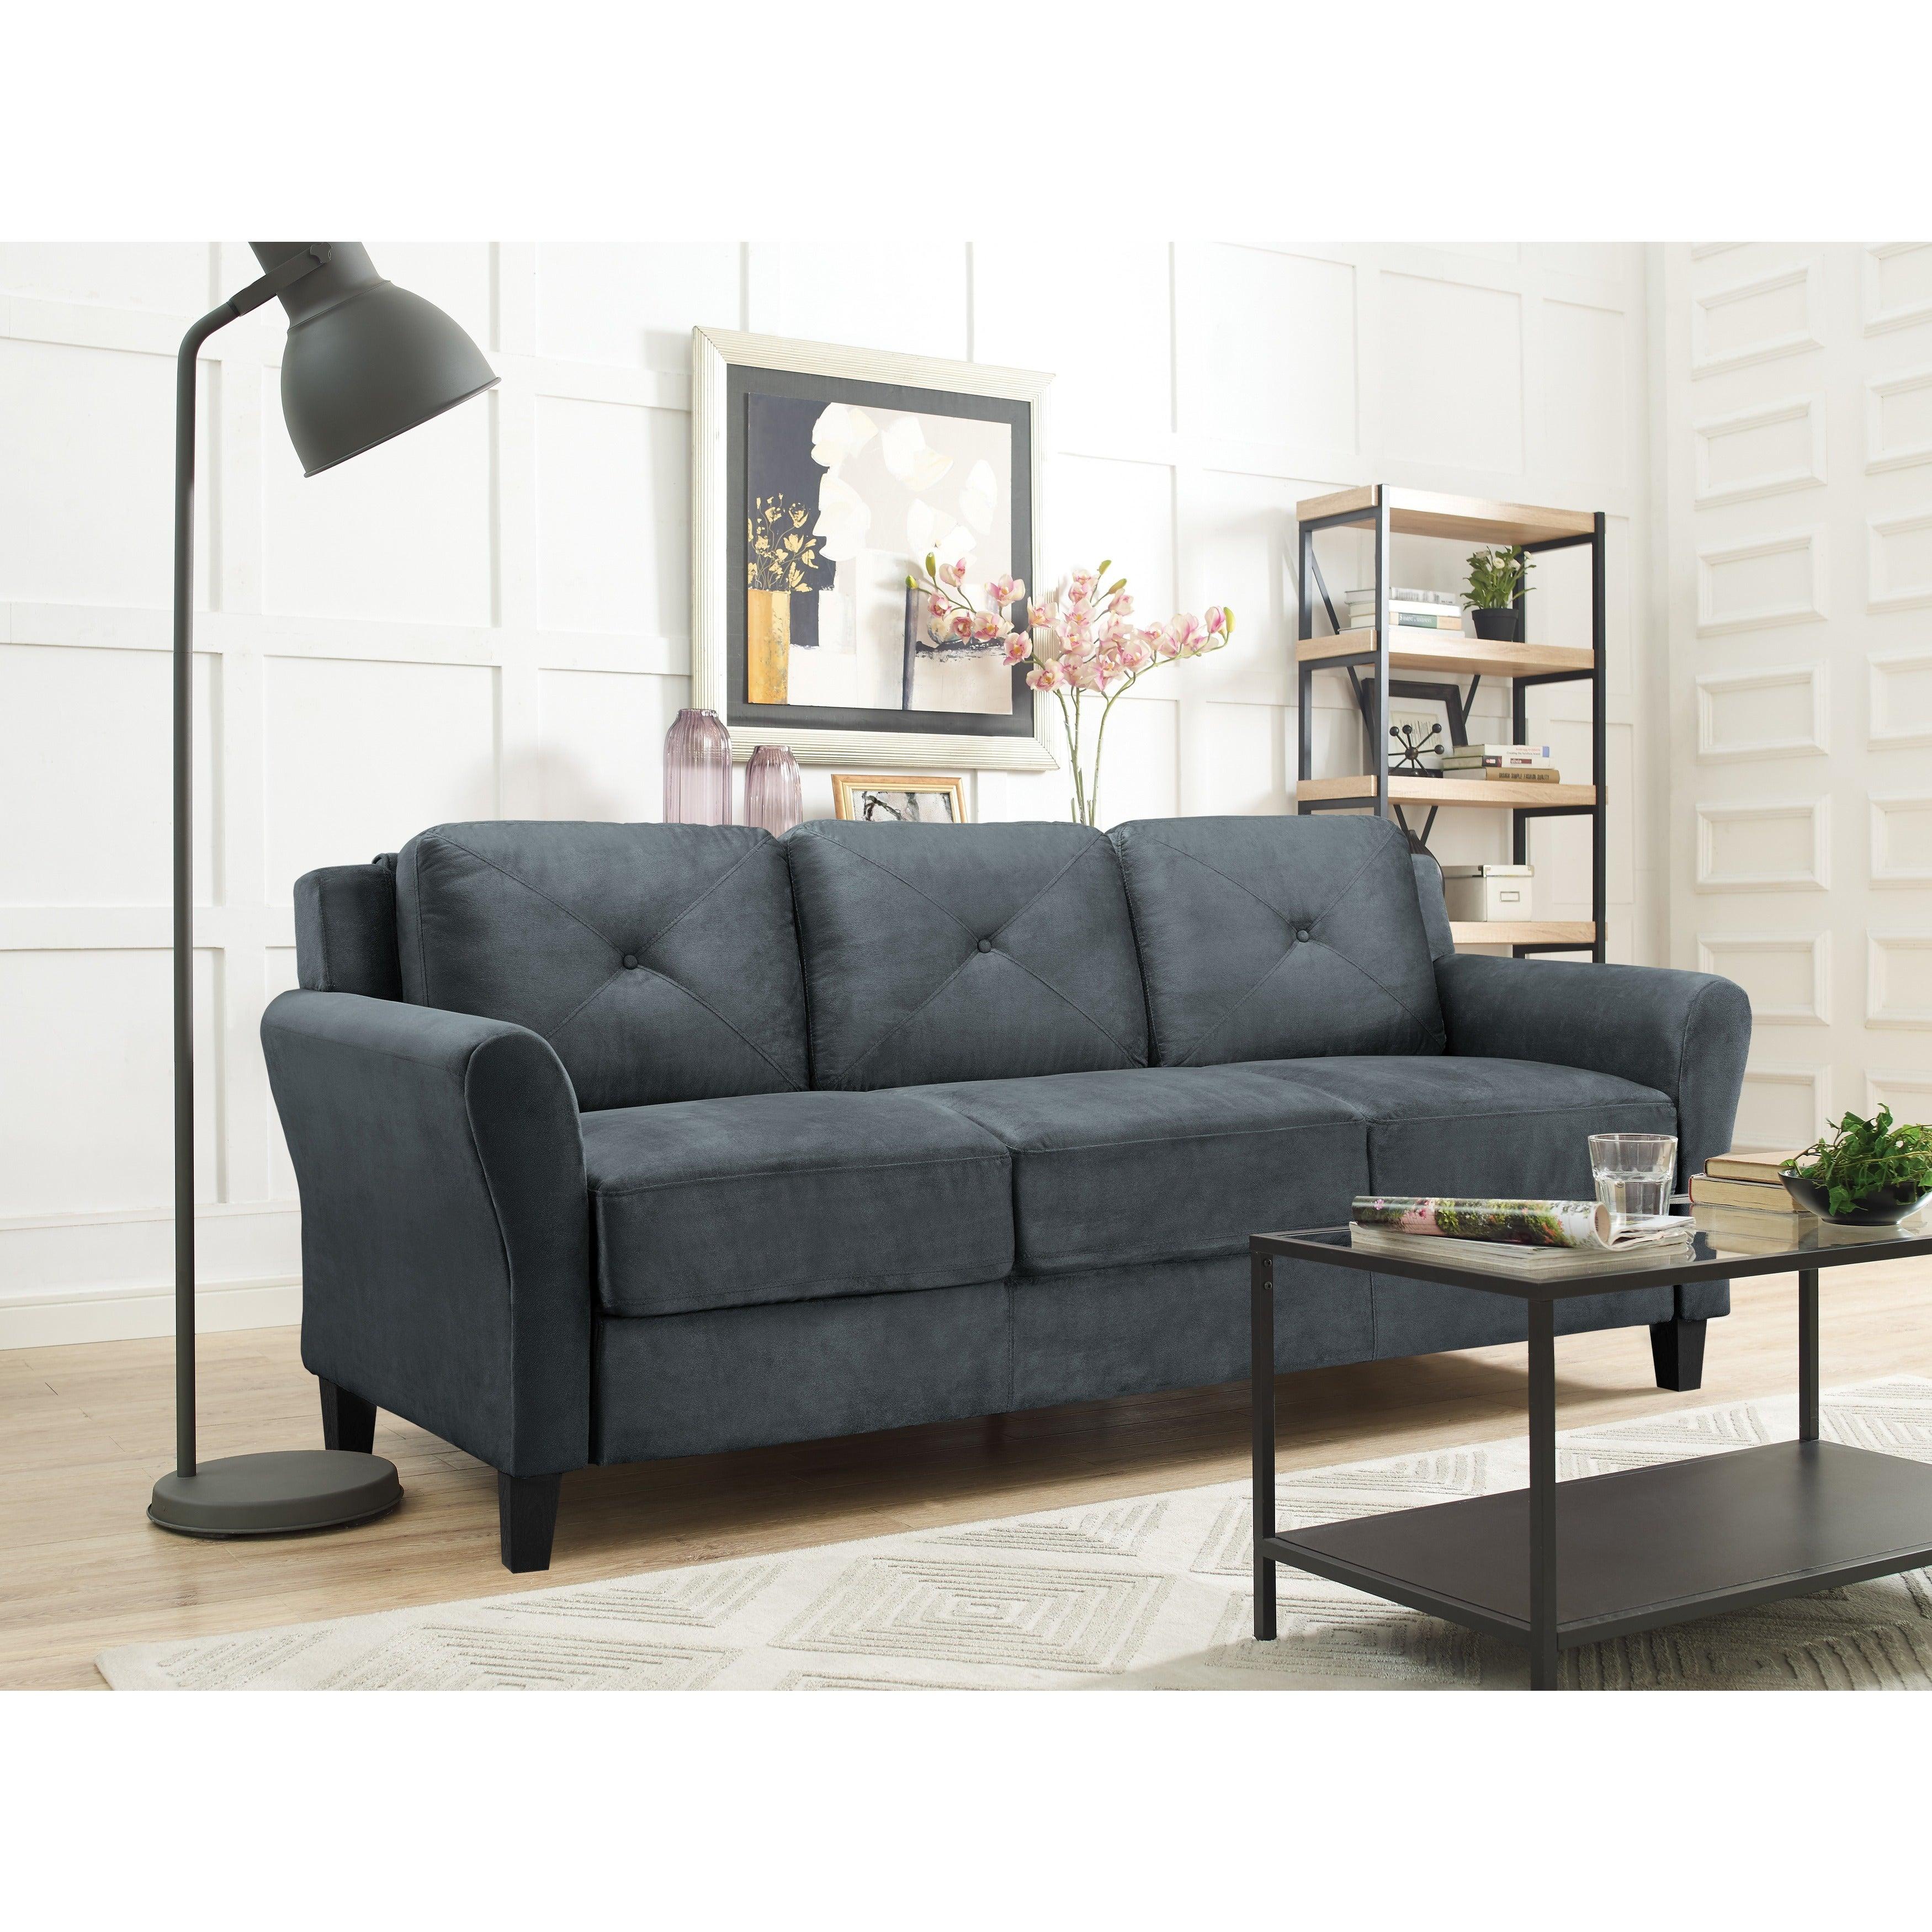 sofa details room furniture itm convertible guest seat love bed microfiber living sleeper